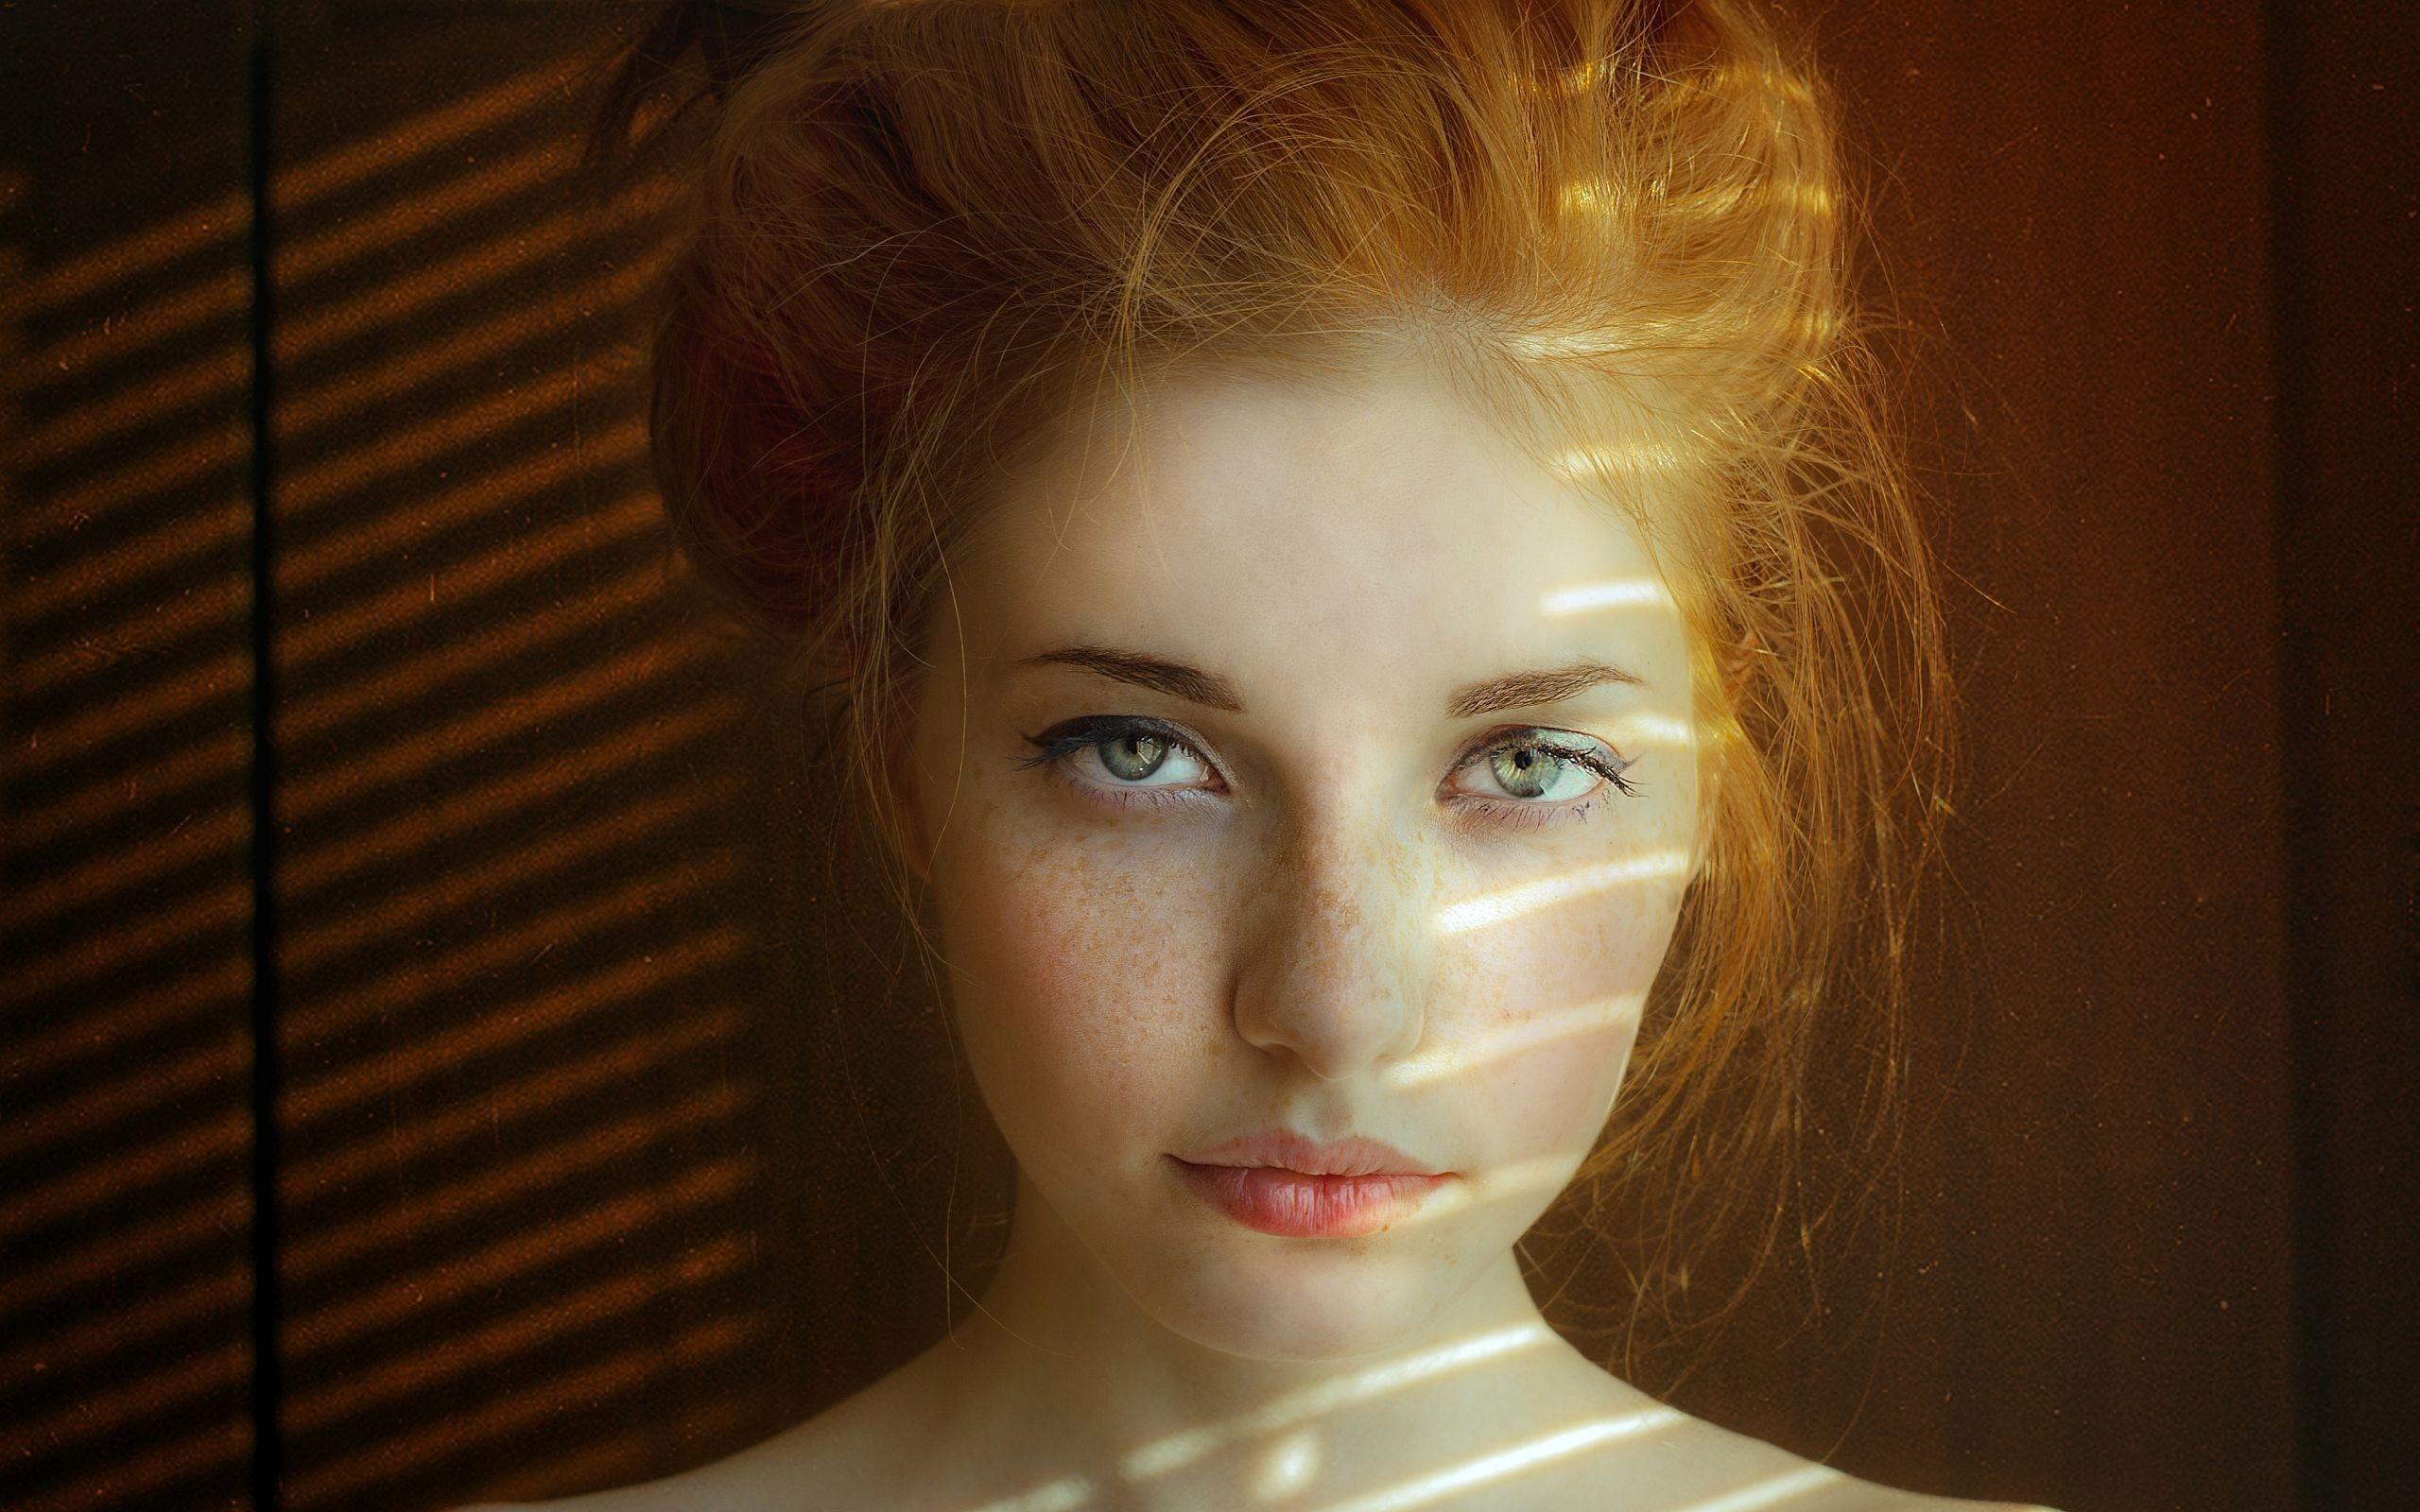 Free Beautiful Redhead Girl With Blue Eyes Computer Red Hair Green Eyes Natural 2560x1600 Wallpaper Teahub Io